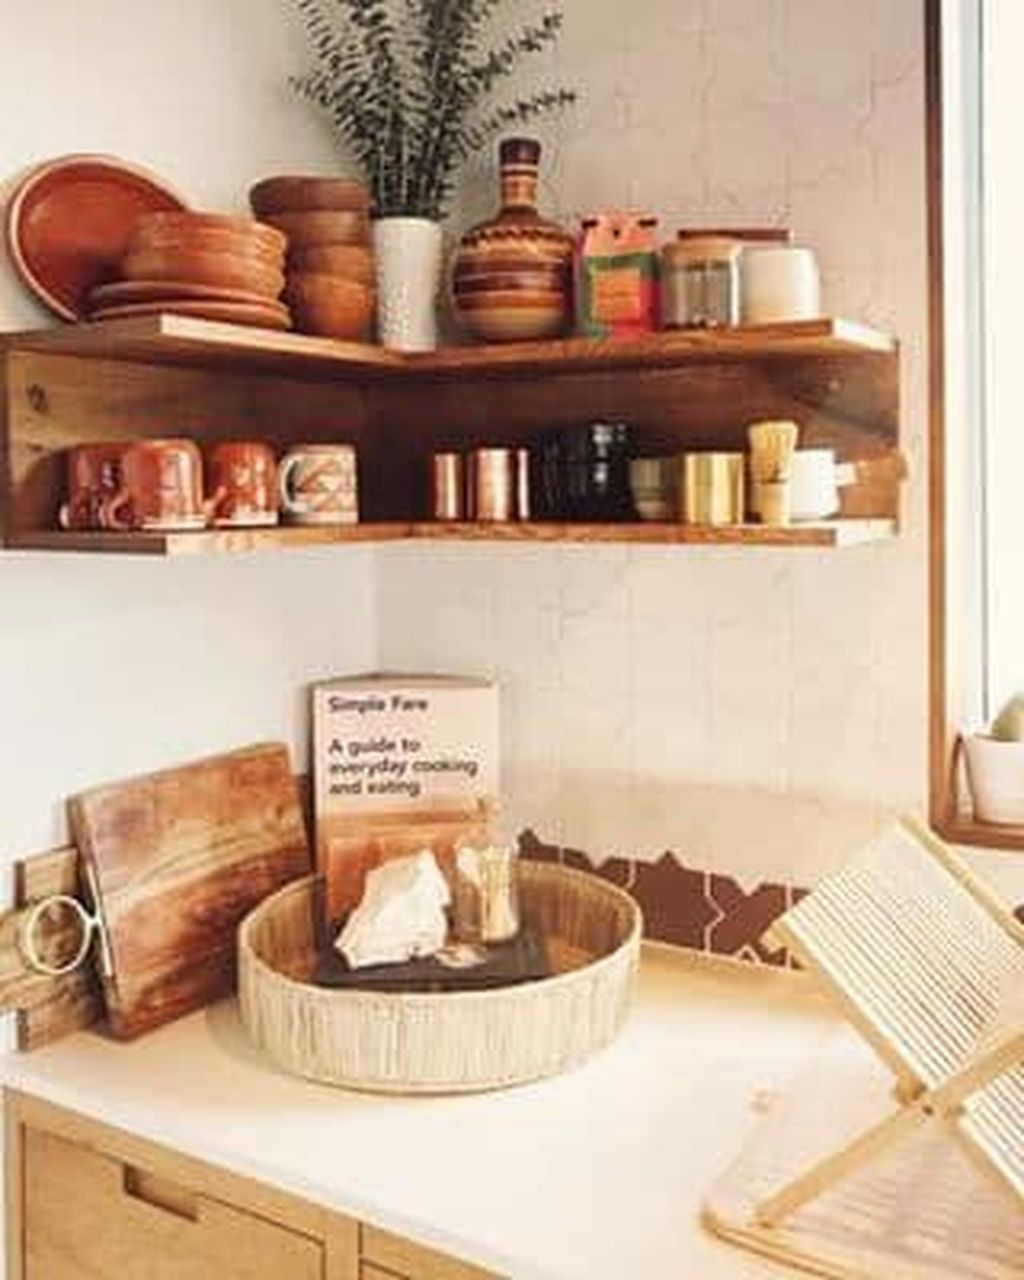 Peachy 47 Cool Kitchen Decor Open Shelves Ideas Kitchen In 2019 Beatyapartments Chair Design Images Beatyapartmentscom